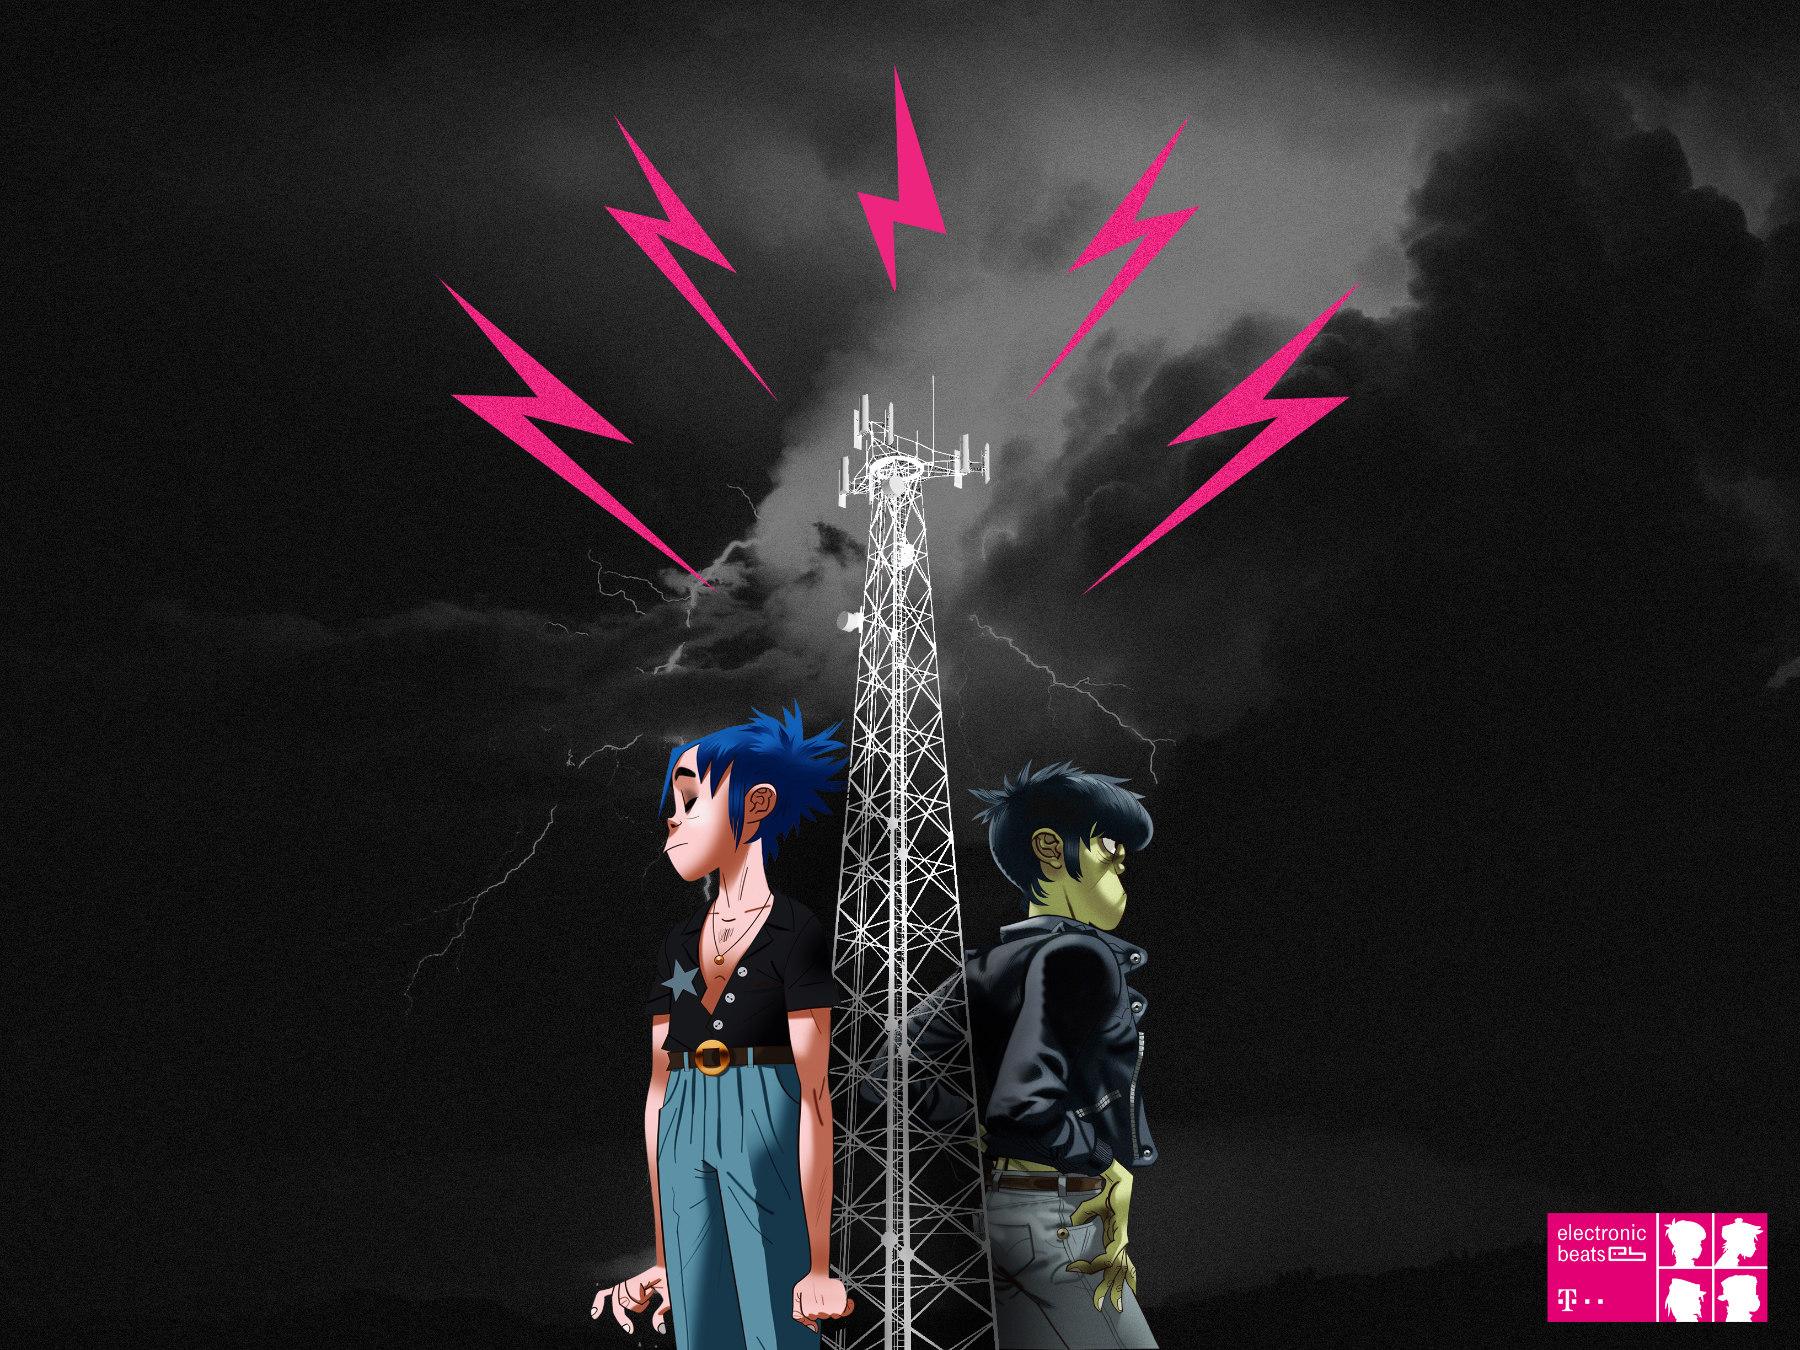 Gorilaz Tower - ©Telekom Electronic Beats/Gorillaz